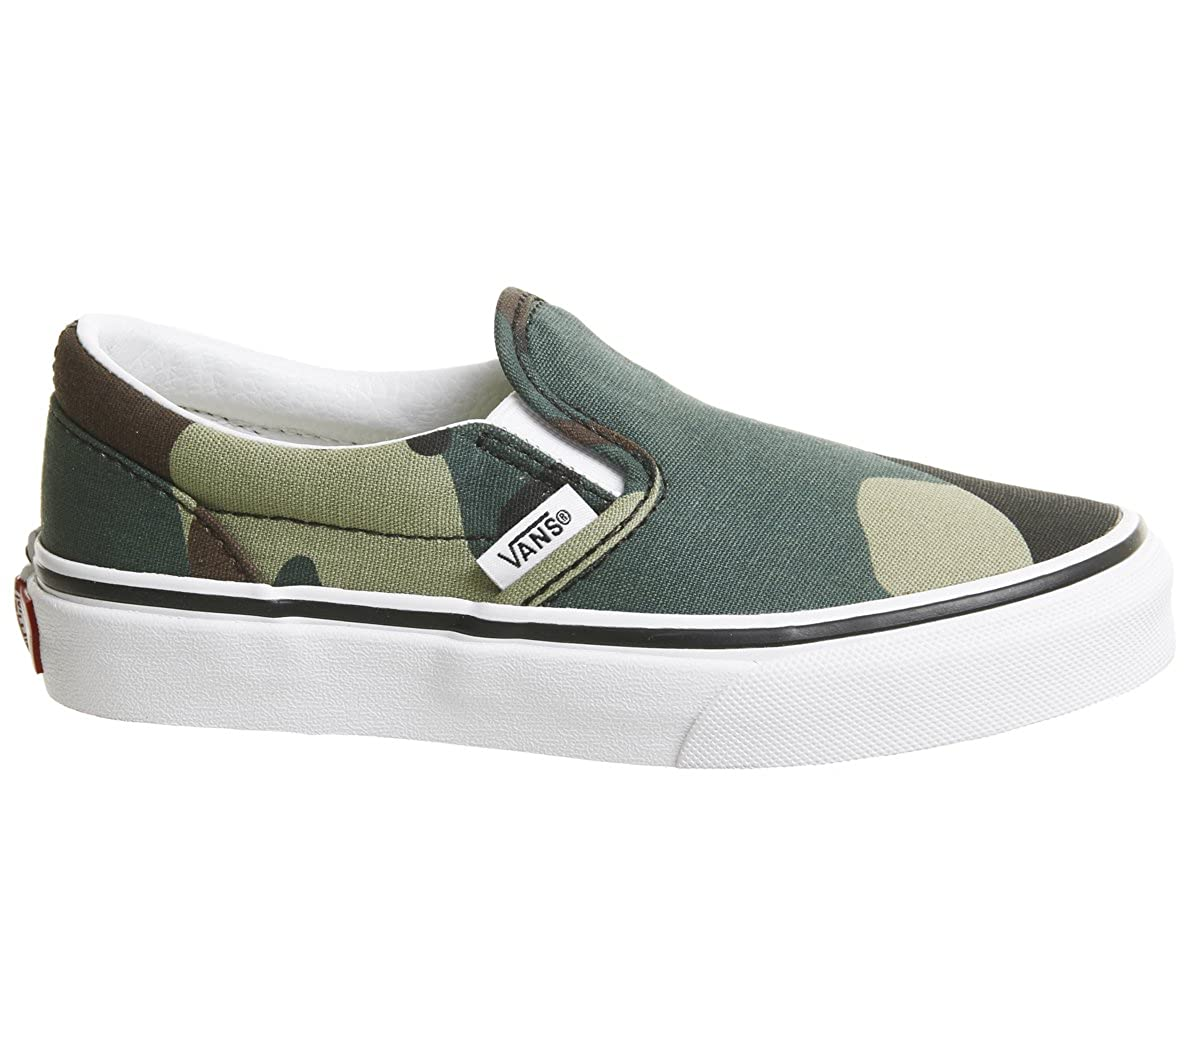 Vans Unisex Kids  Peanuts Classic Slip-on Trainers  Amazon.co.uk  Shoes    Bags 572d9dbe0052a